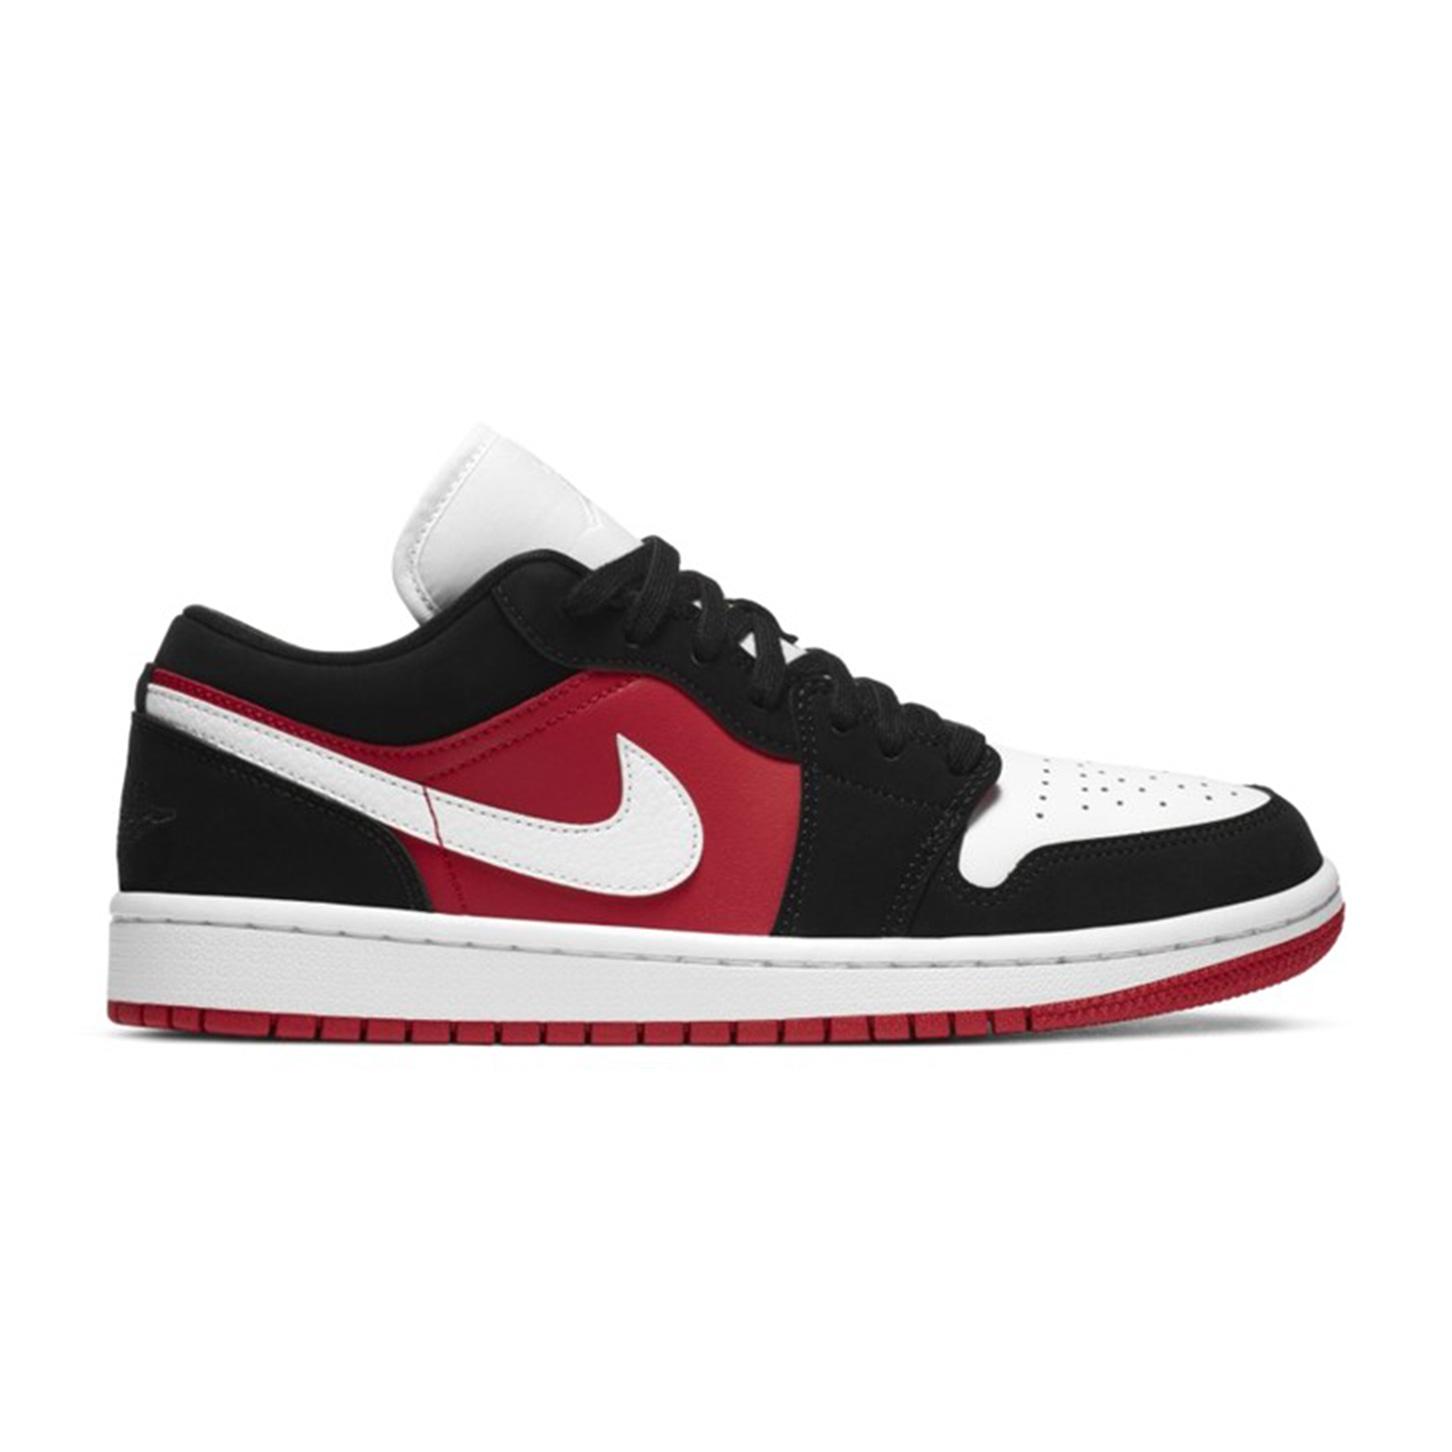 Jordan 1 Low Gym Red Black (W)